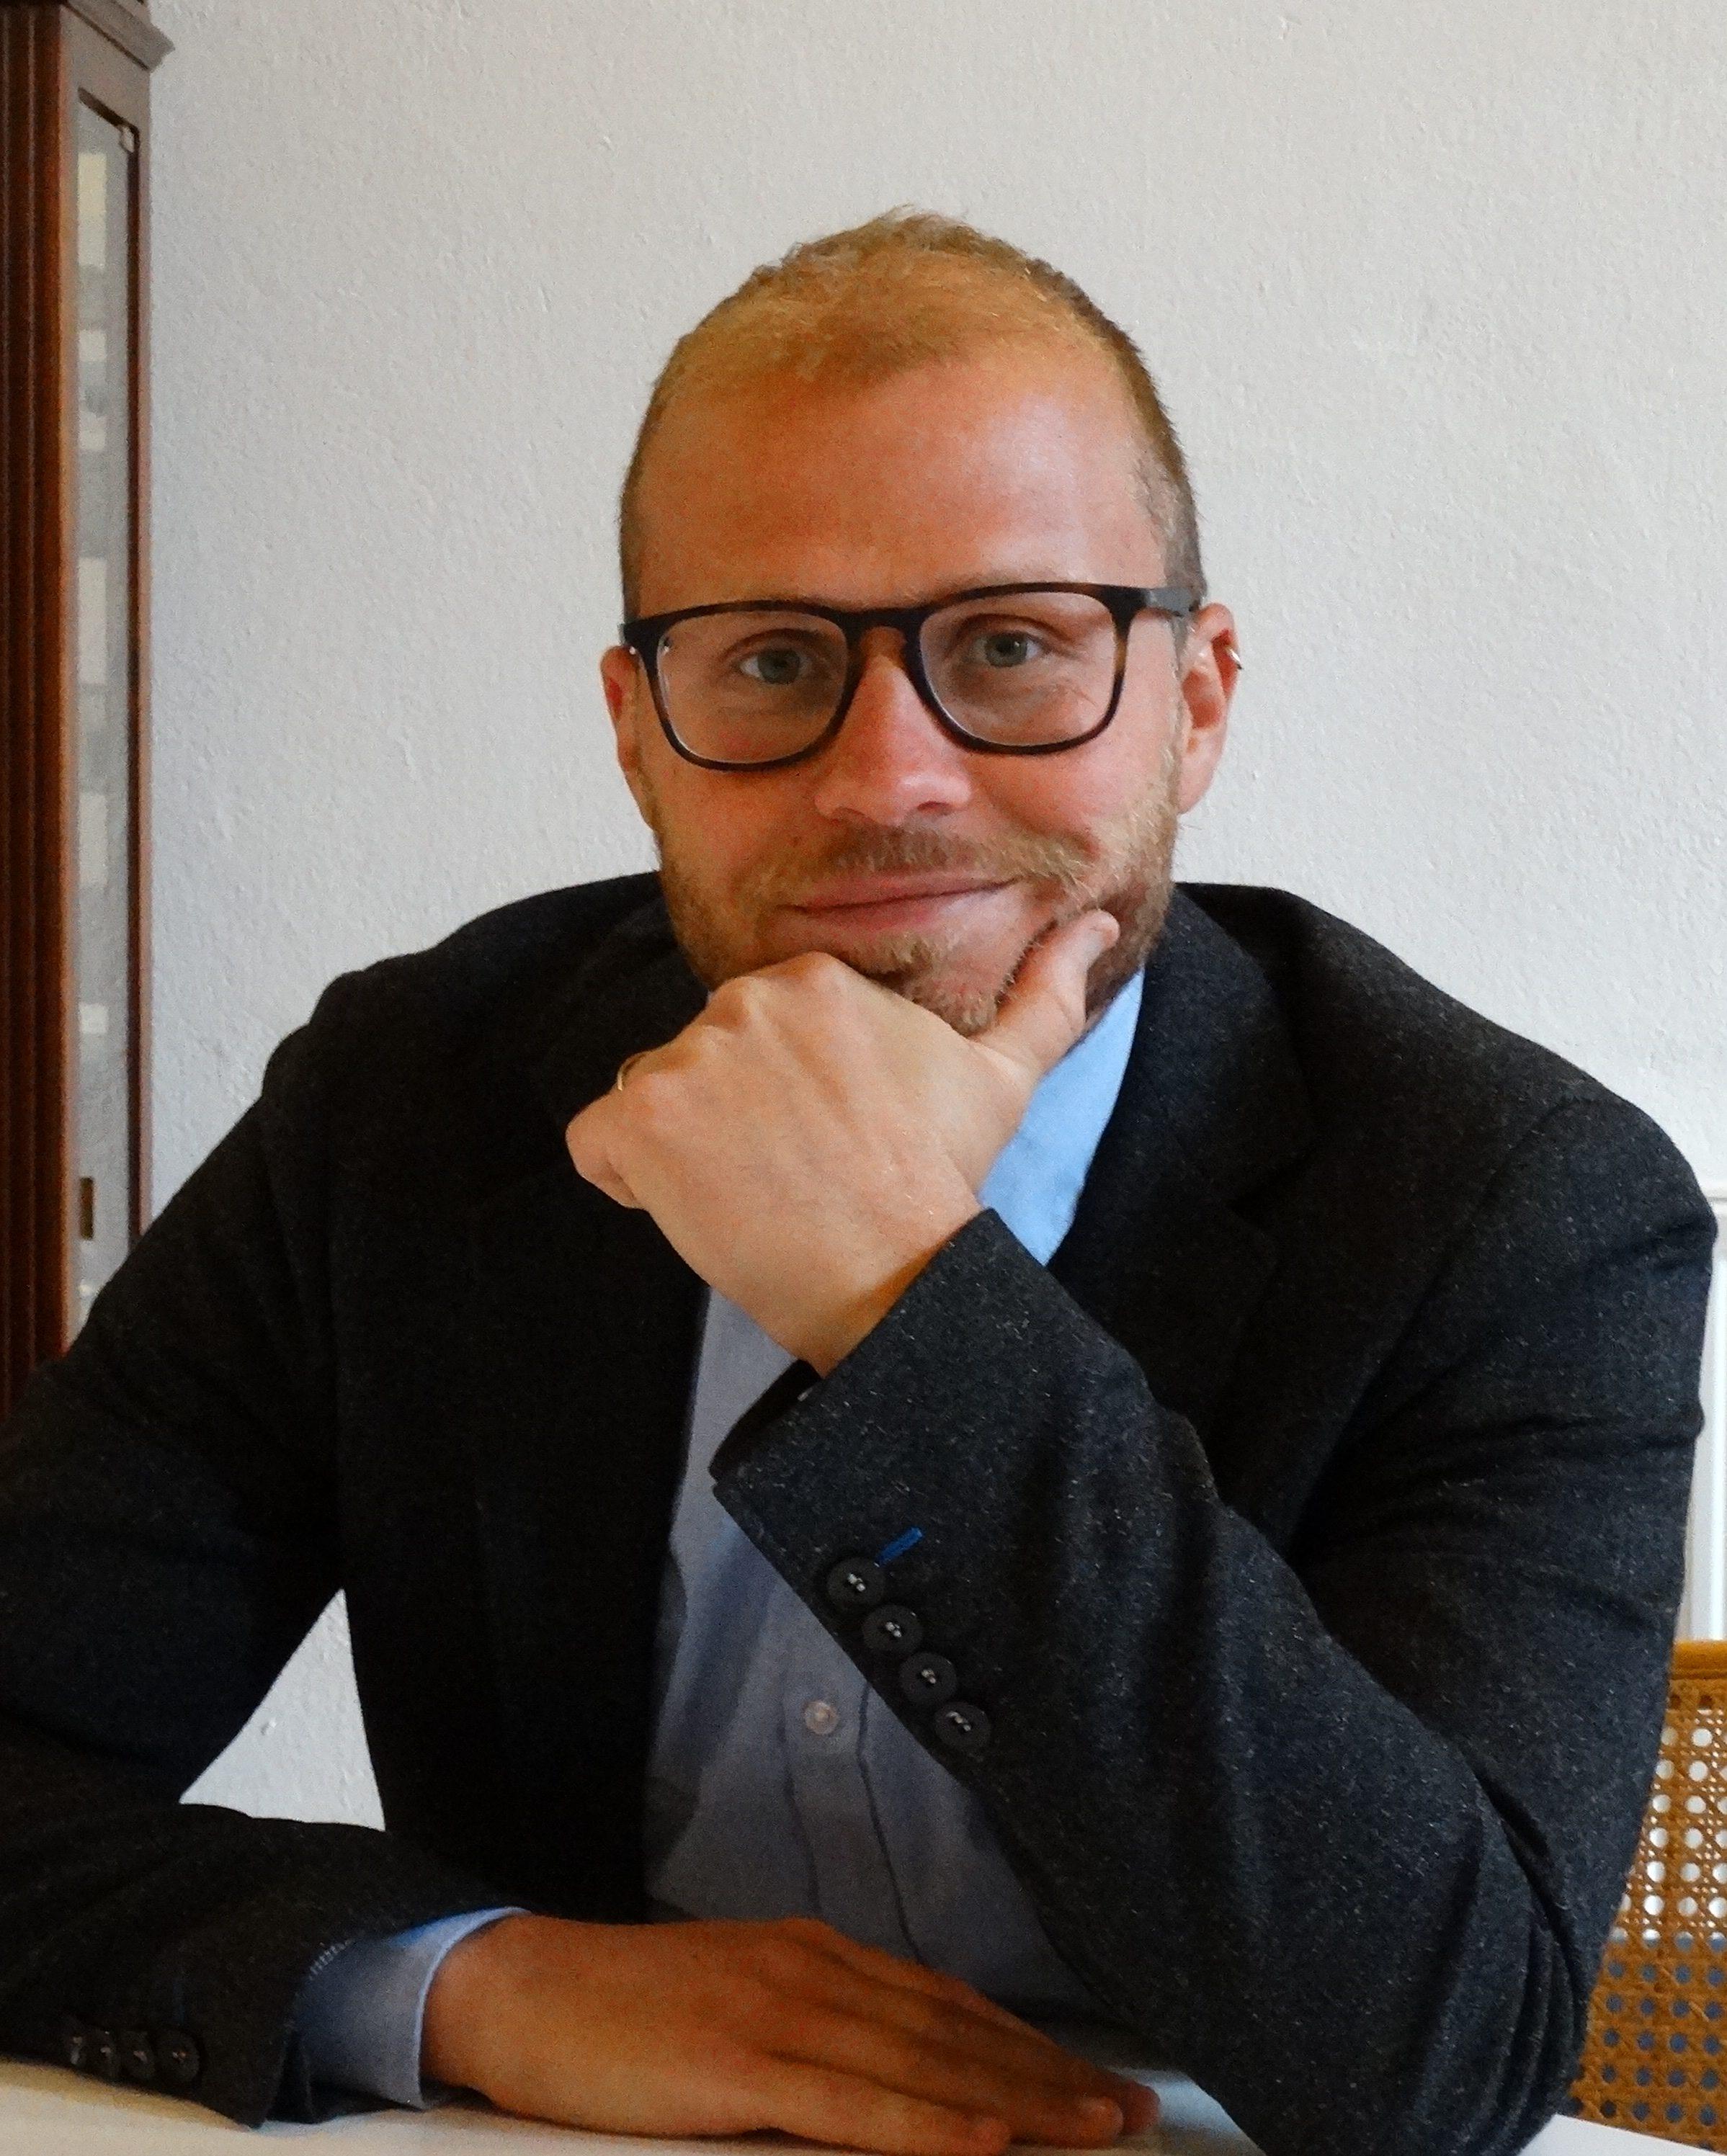 Dario Fazzi, Treasurer : Research Fellow, Roosevelt Institute for American Studies, Middelburg